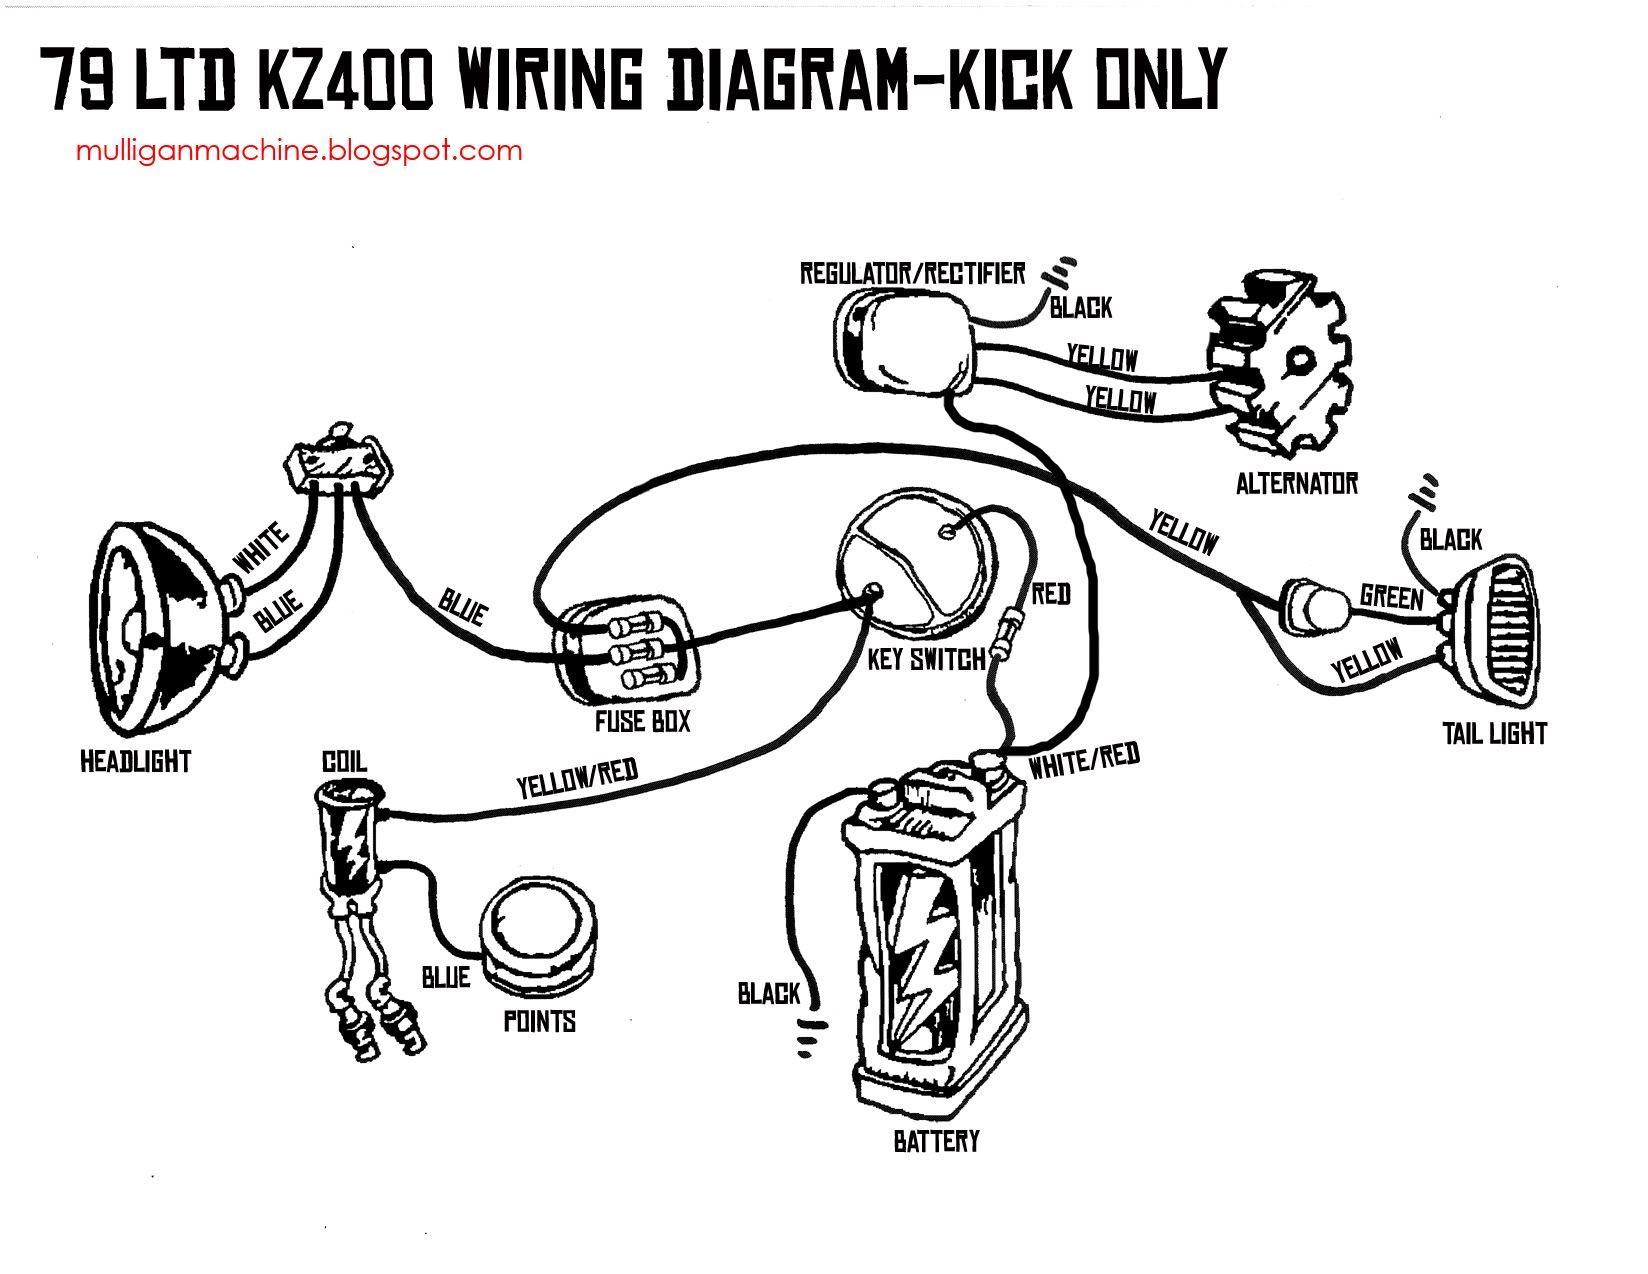 Kawasaki 454 Ltd Wiring Diagram on Kawasaki Vulcan 750 Wiring Diagram